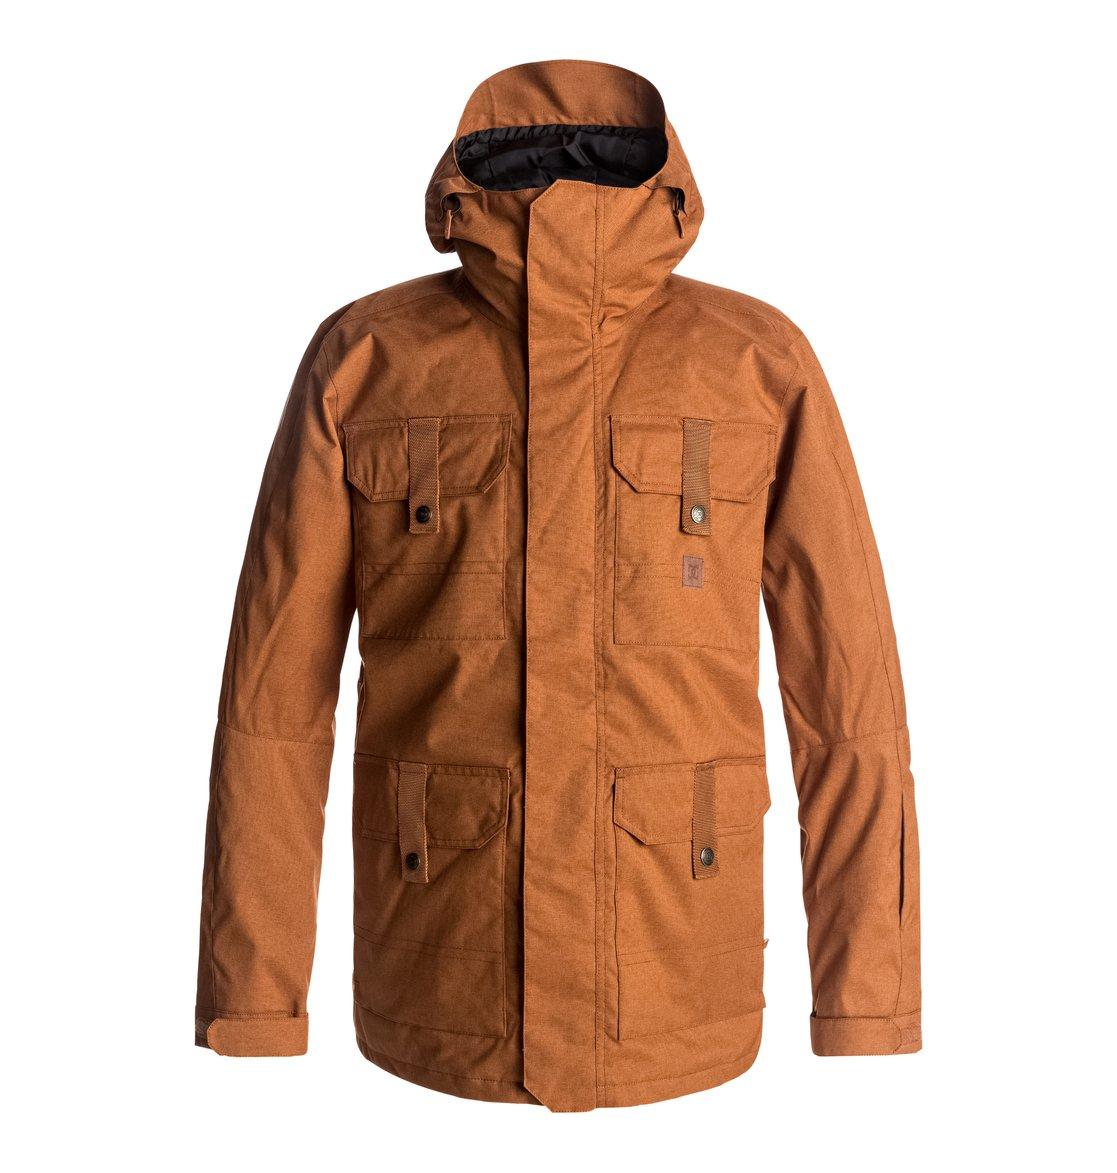 Сноубордическая куртка Servo от DC Shoes